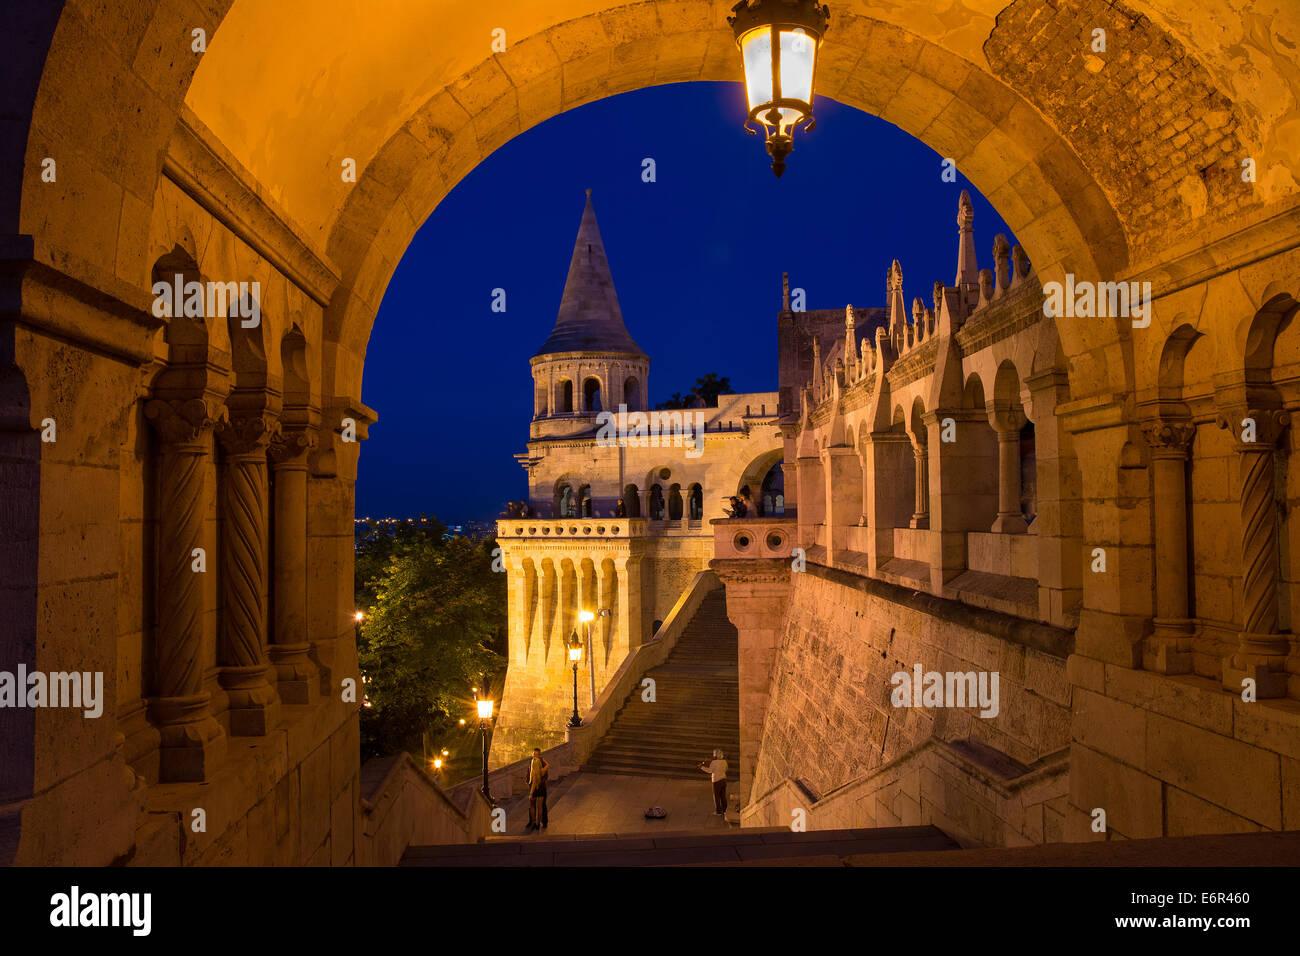 The Fisherman's Bastion Budapest Hungary Nighttime - Stock Image